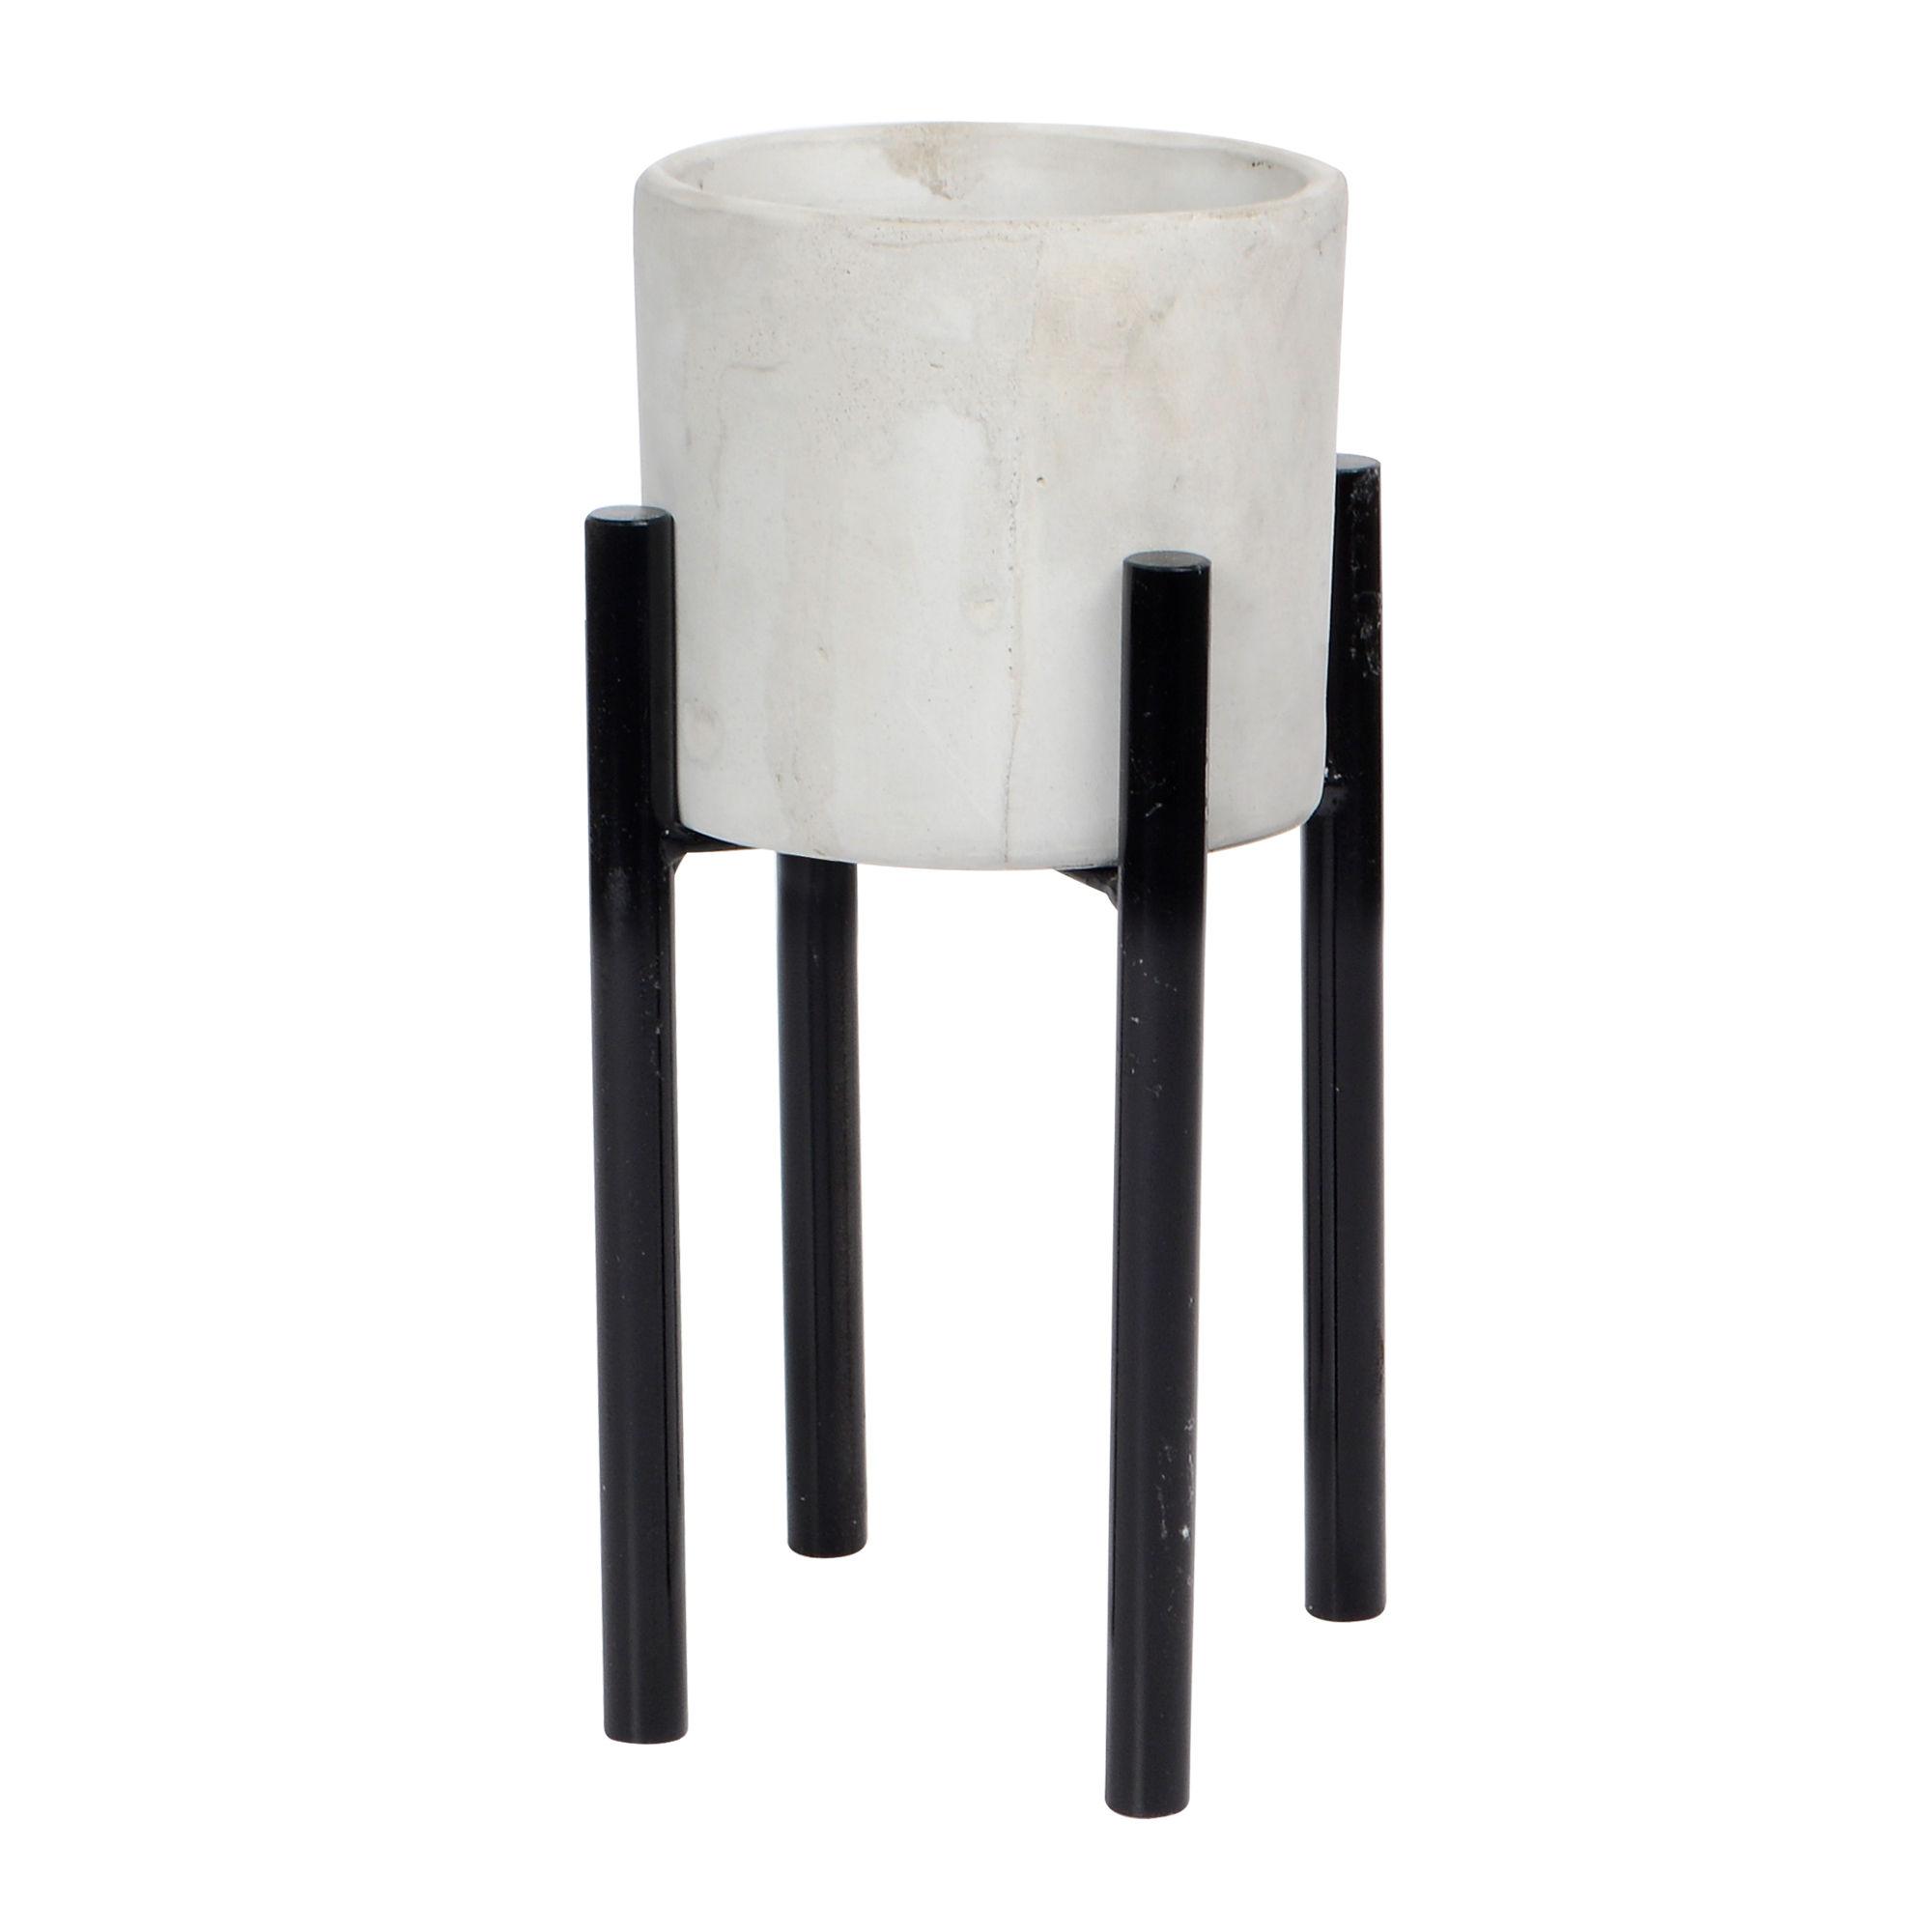 Vaso e concreto redondo com base de Ferro